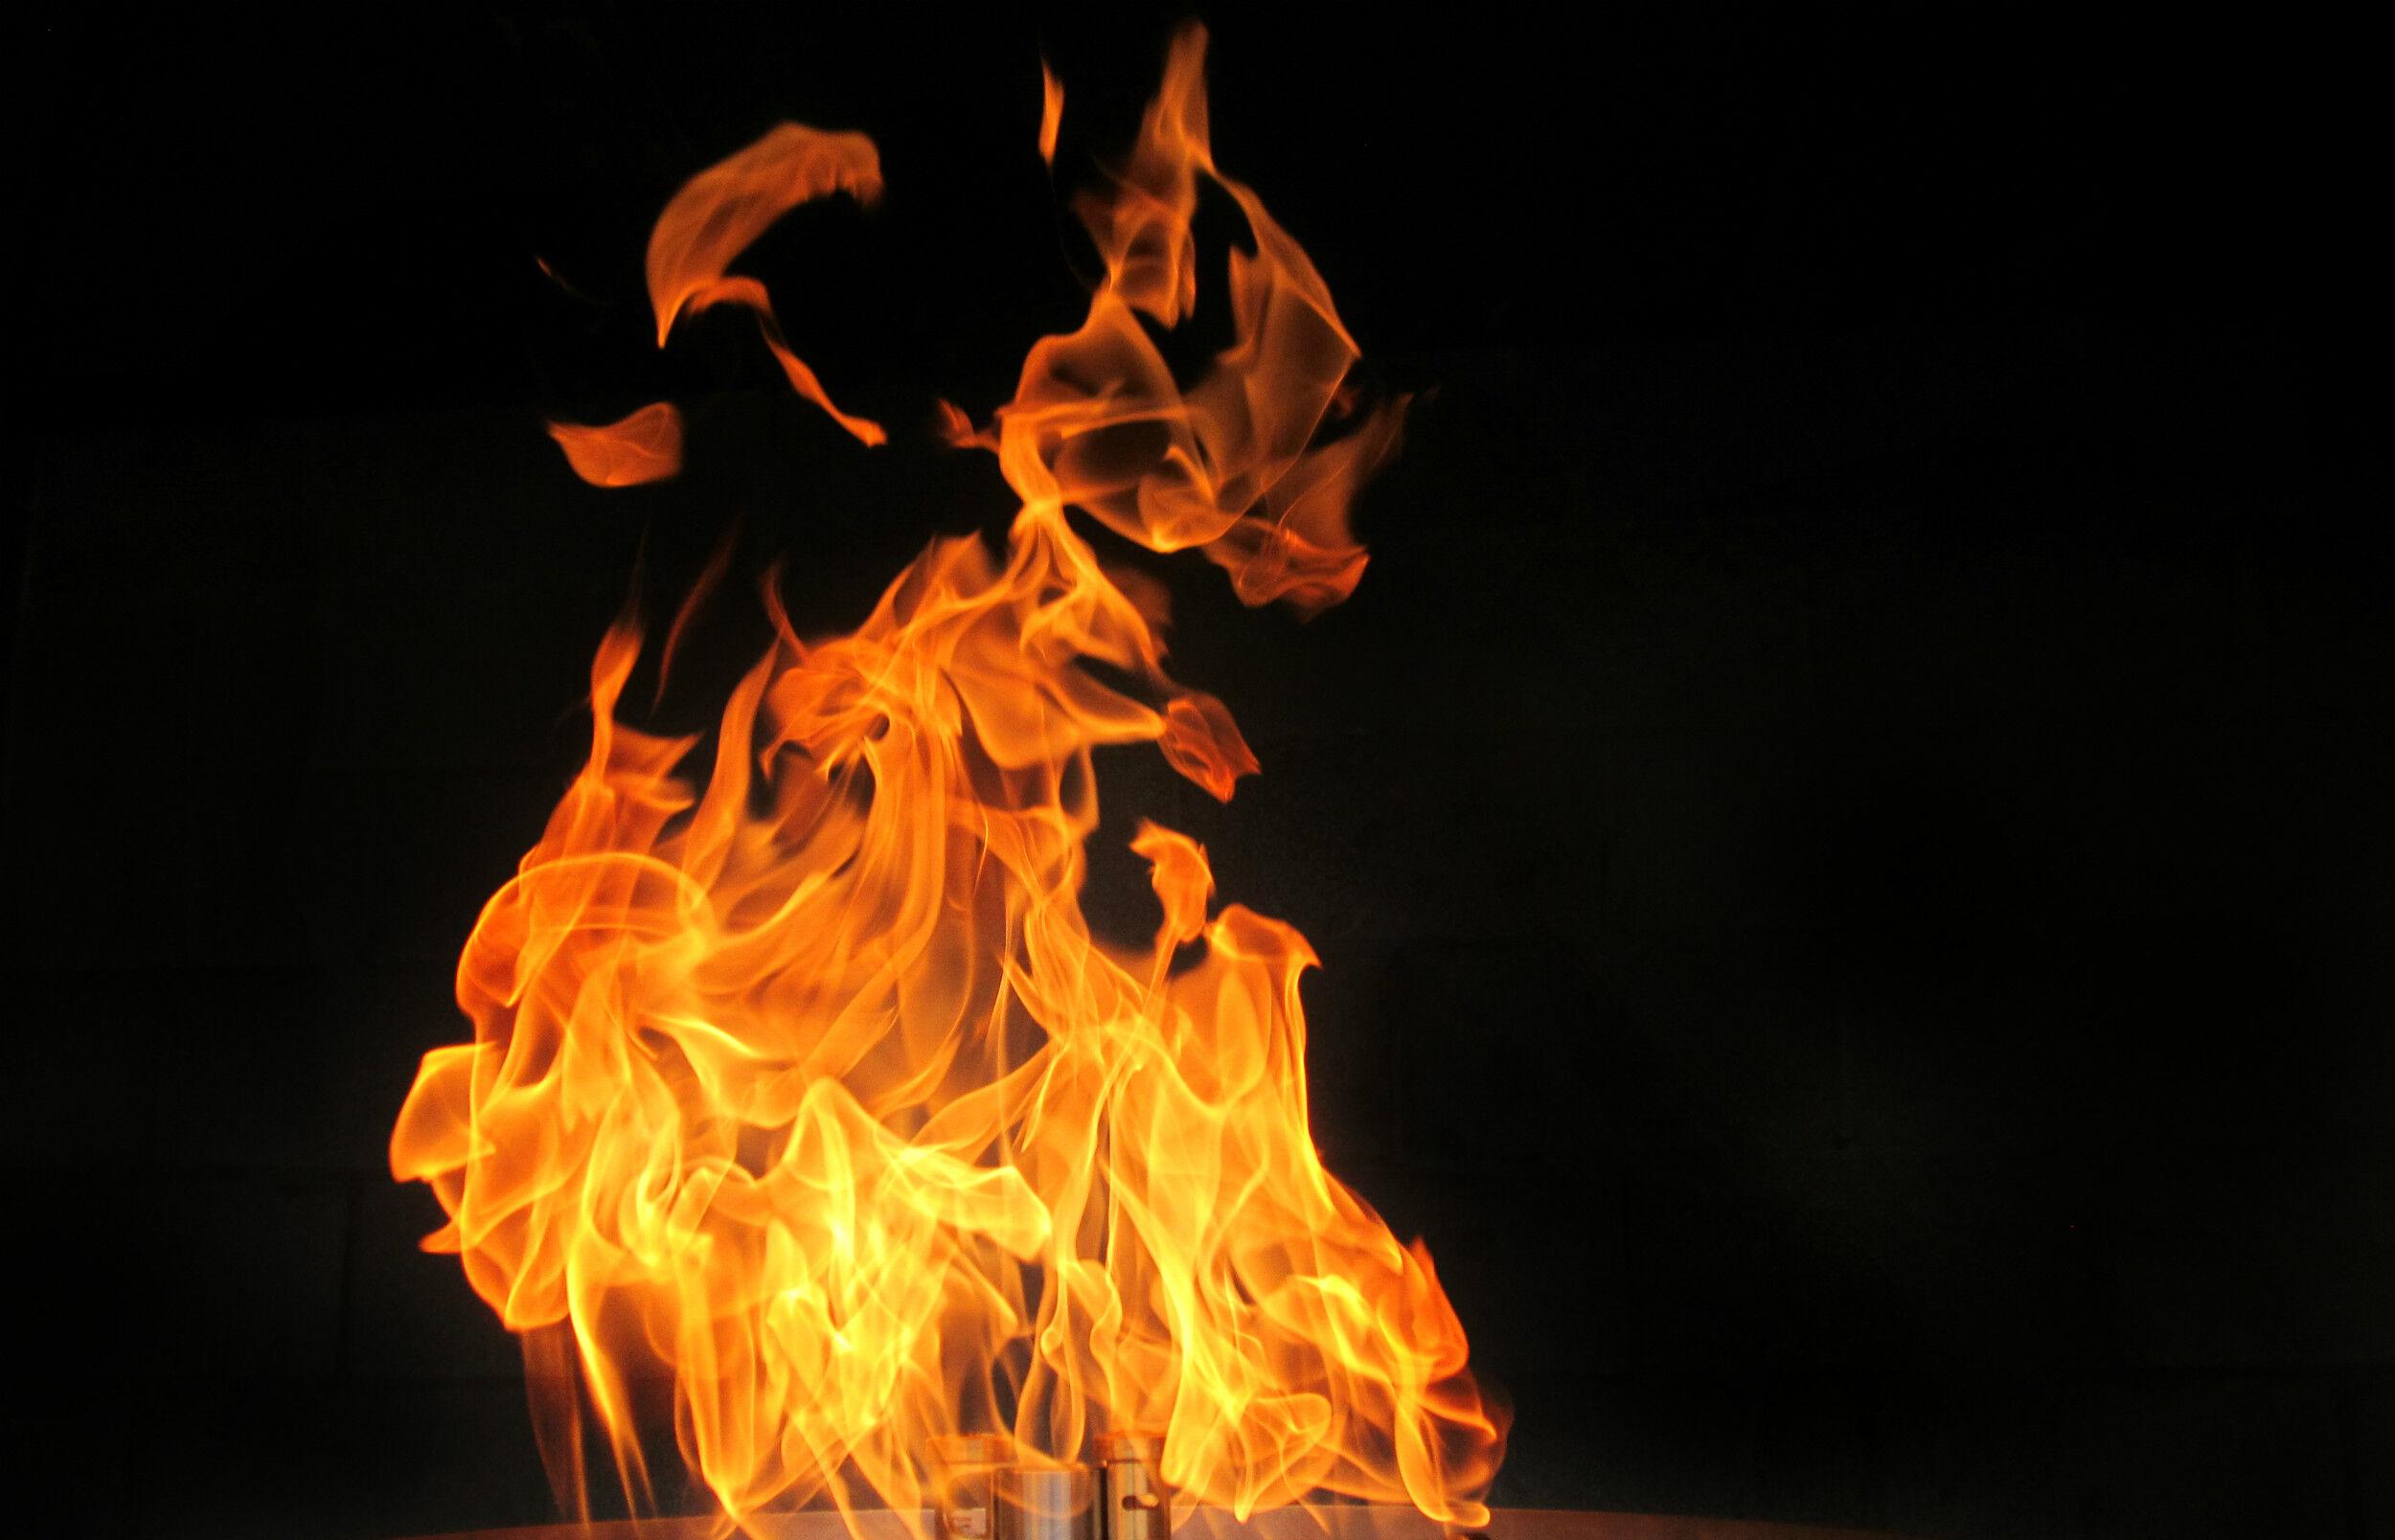 Top Gas Fire Pit Burner Kits Woodlanddirect Com